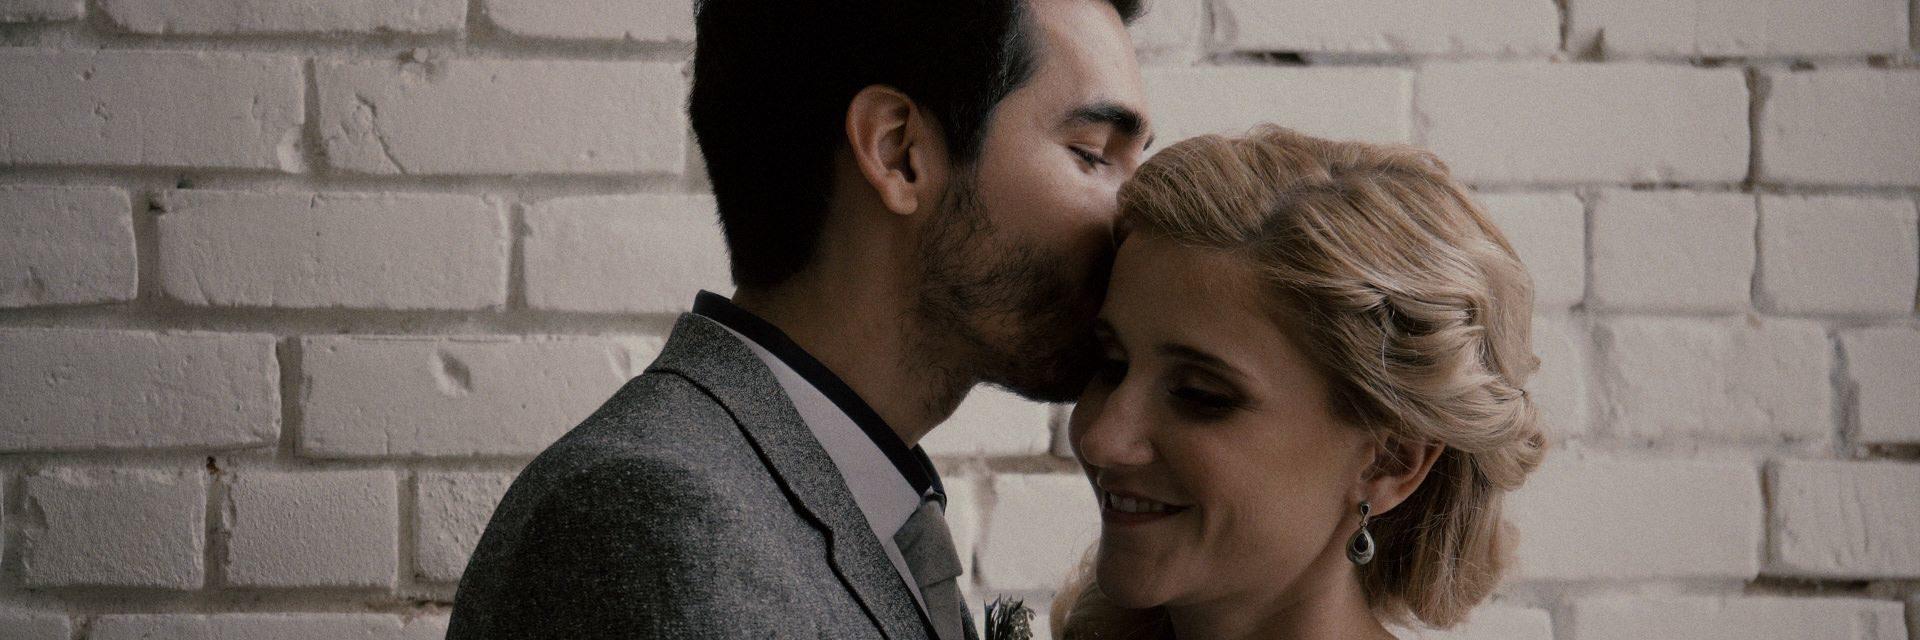 Rabat-wedding-videographer-cinemate-films-03